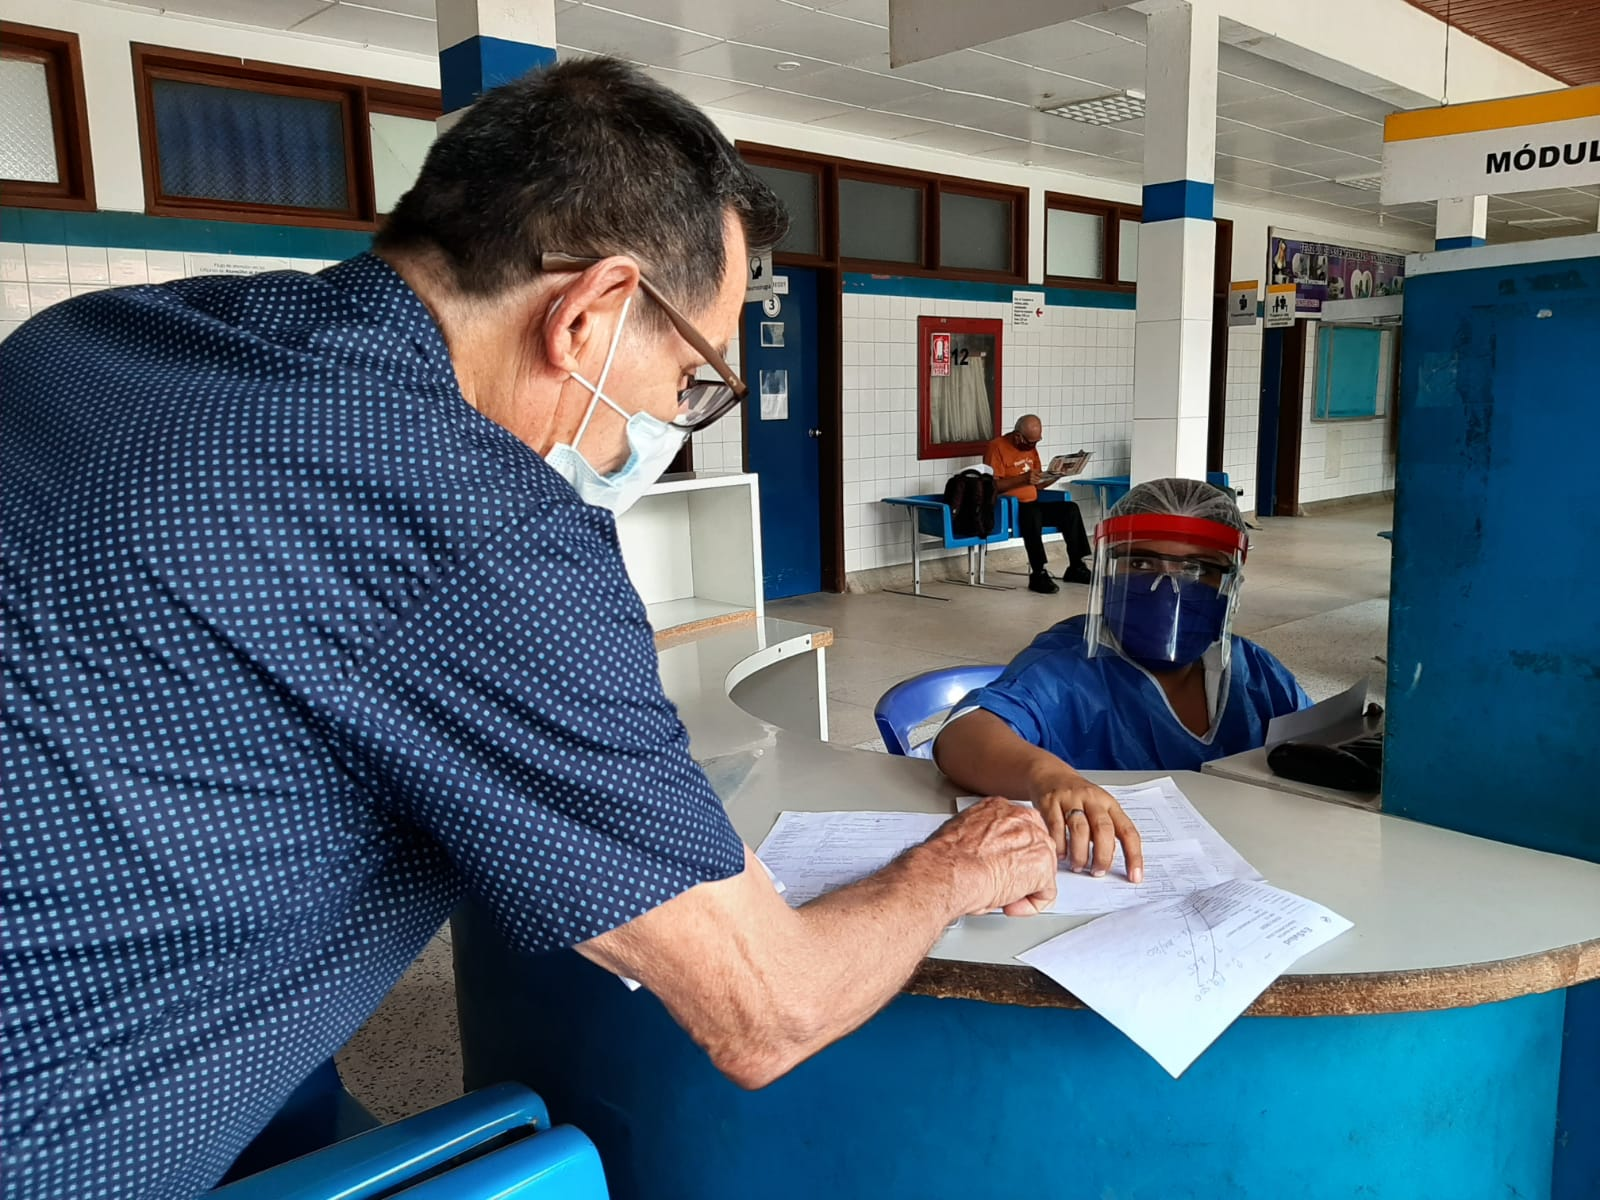 Essalud - EsSalud Loreto reinicia atenciones de consulta externa